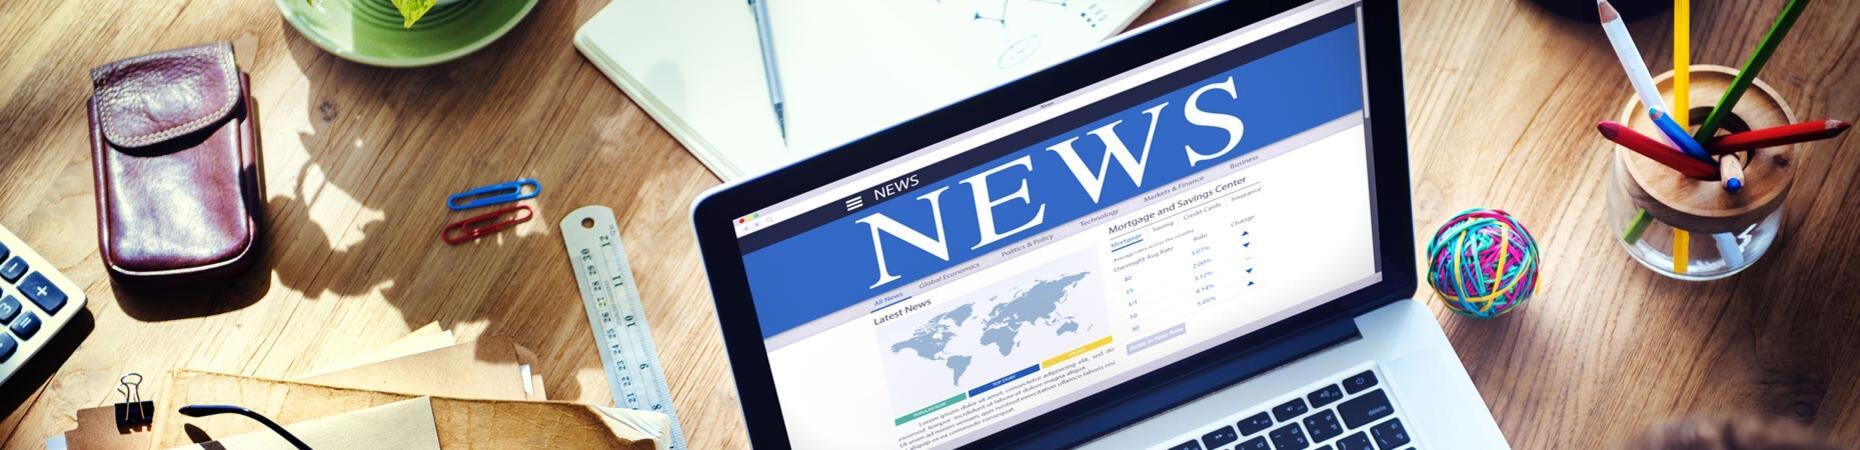 eco-service it news-ditta-di-pulizie 006